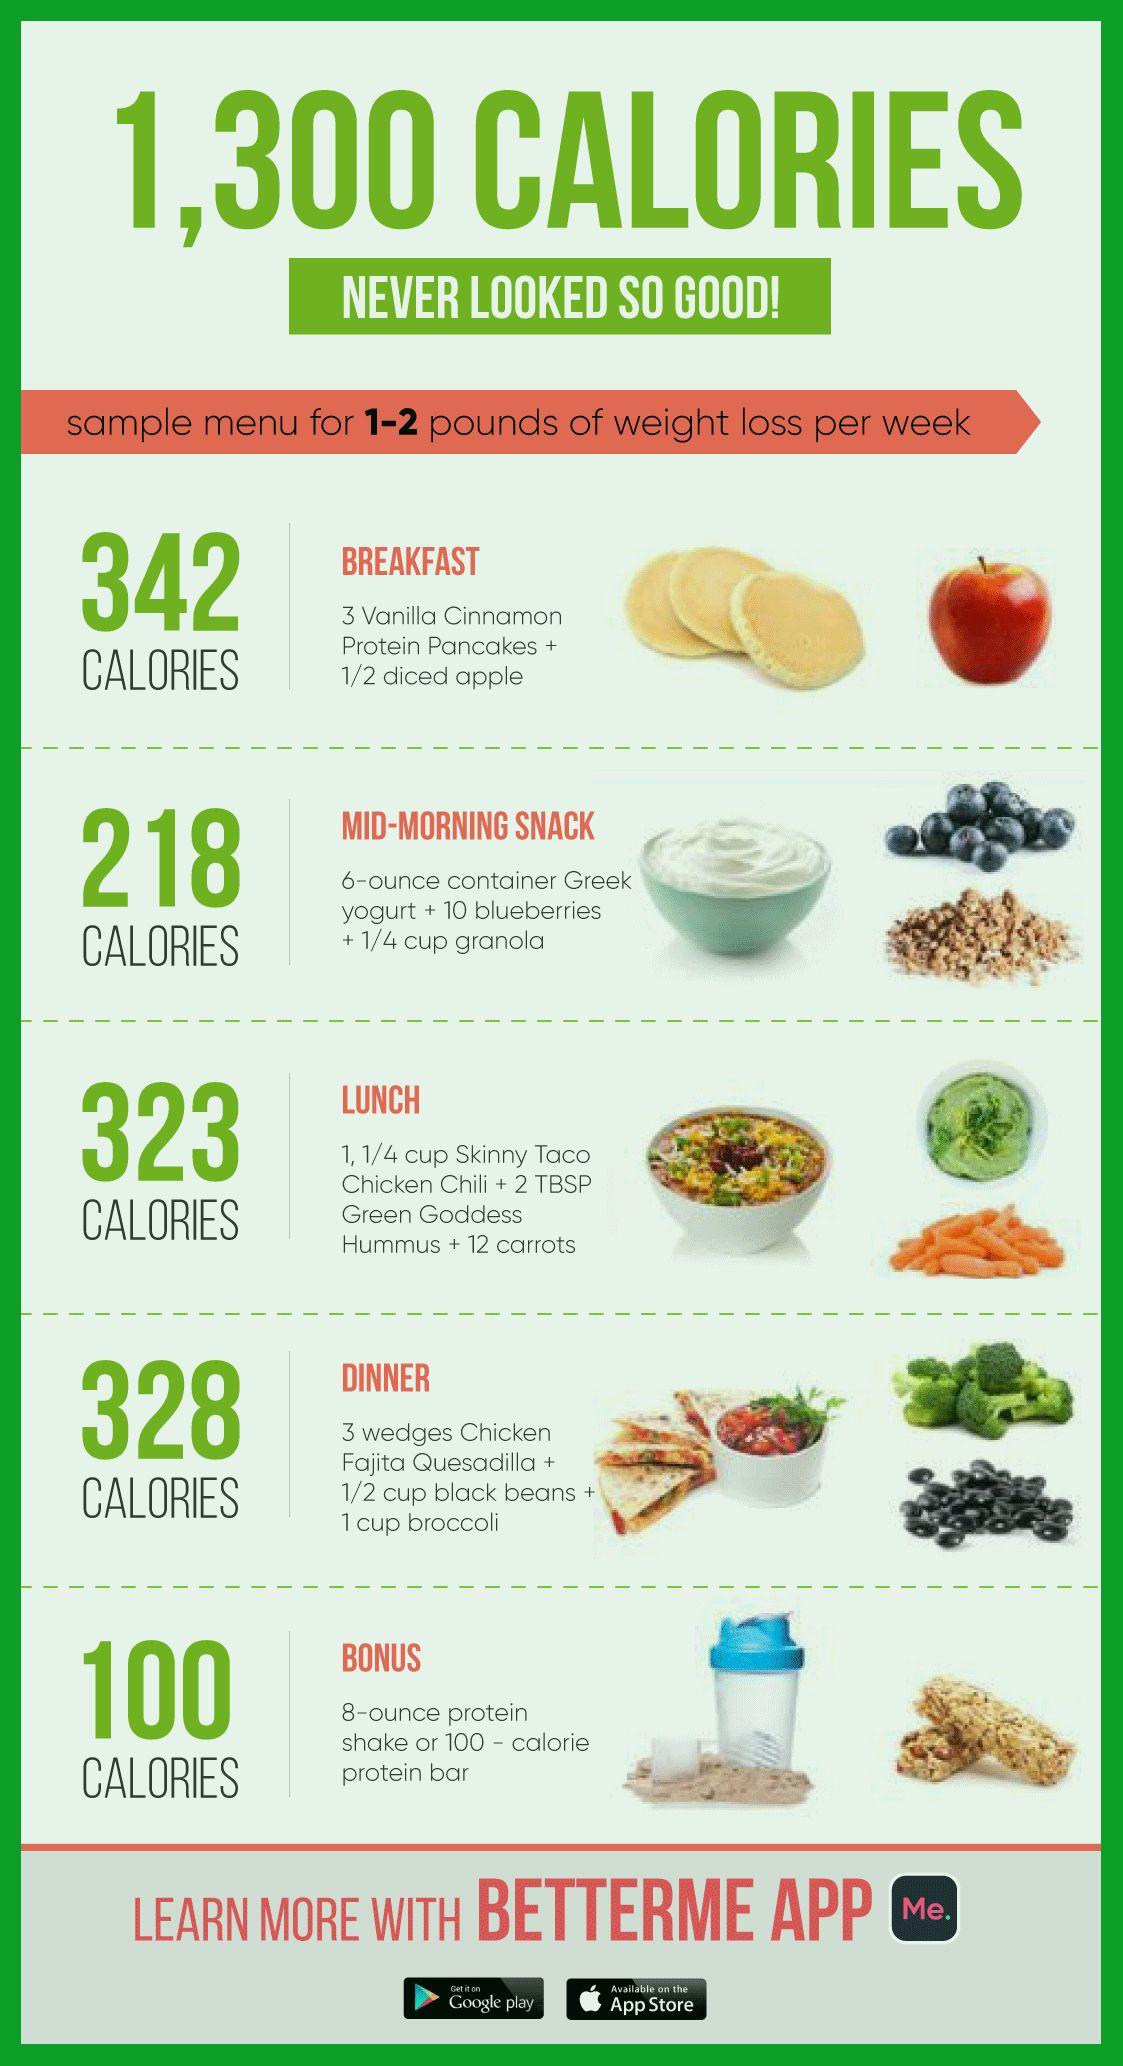 diet plan that burns calories